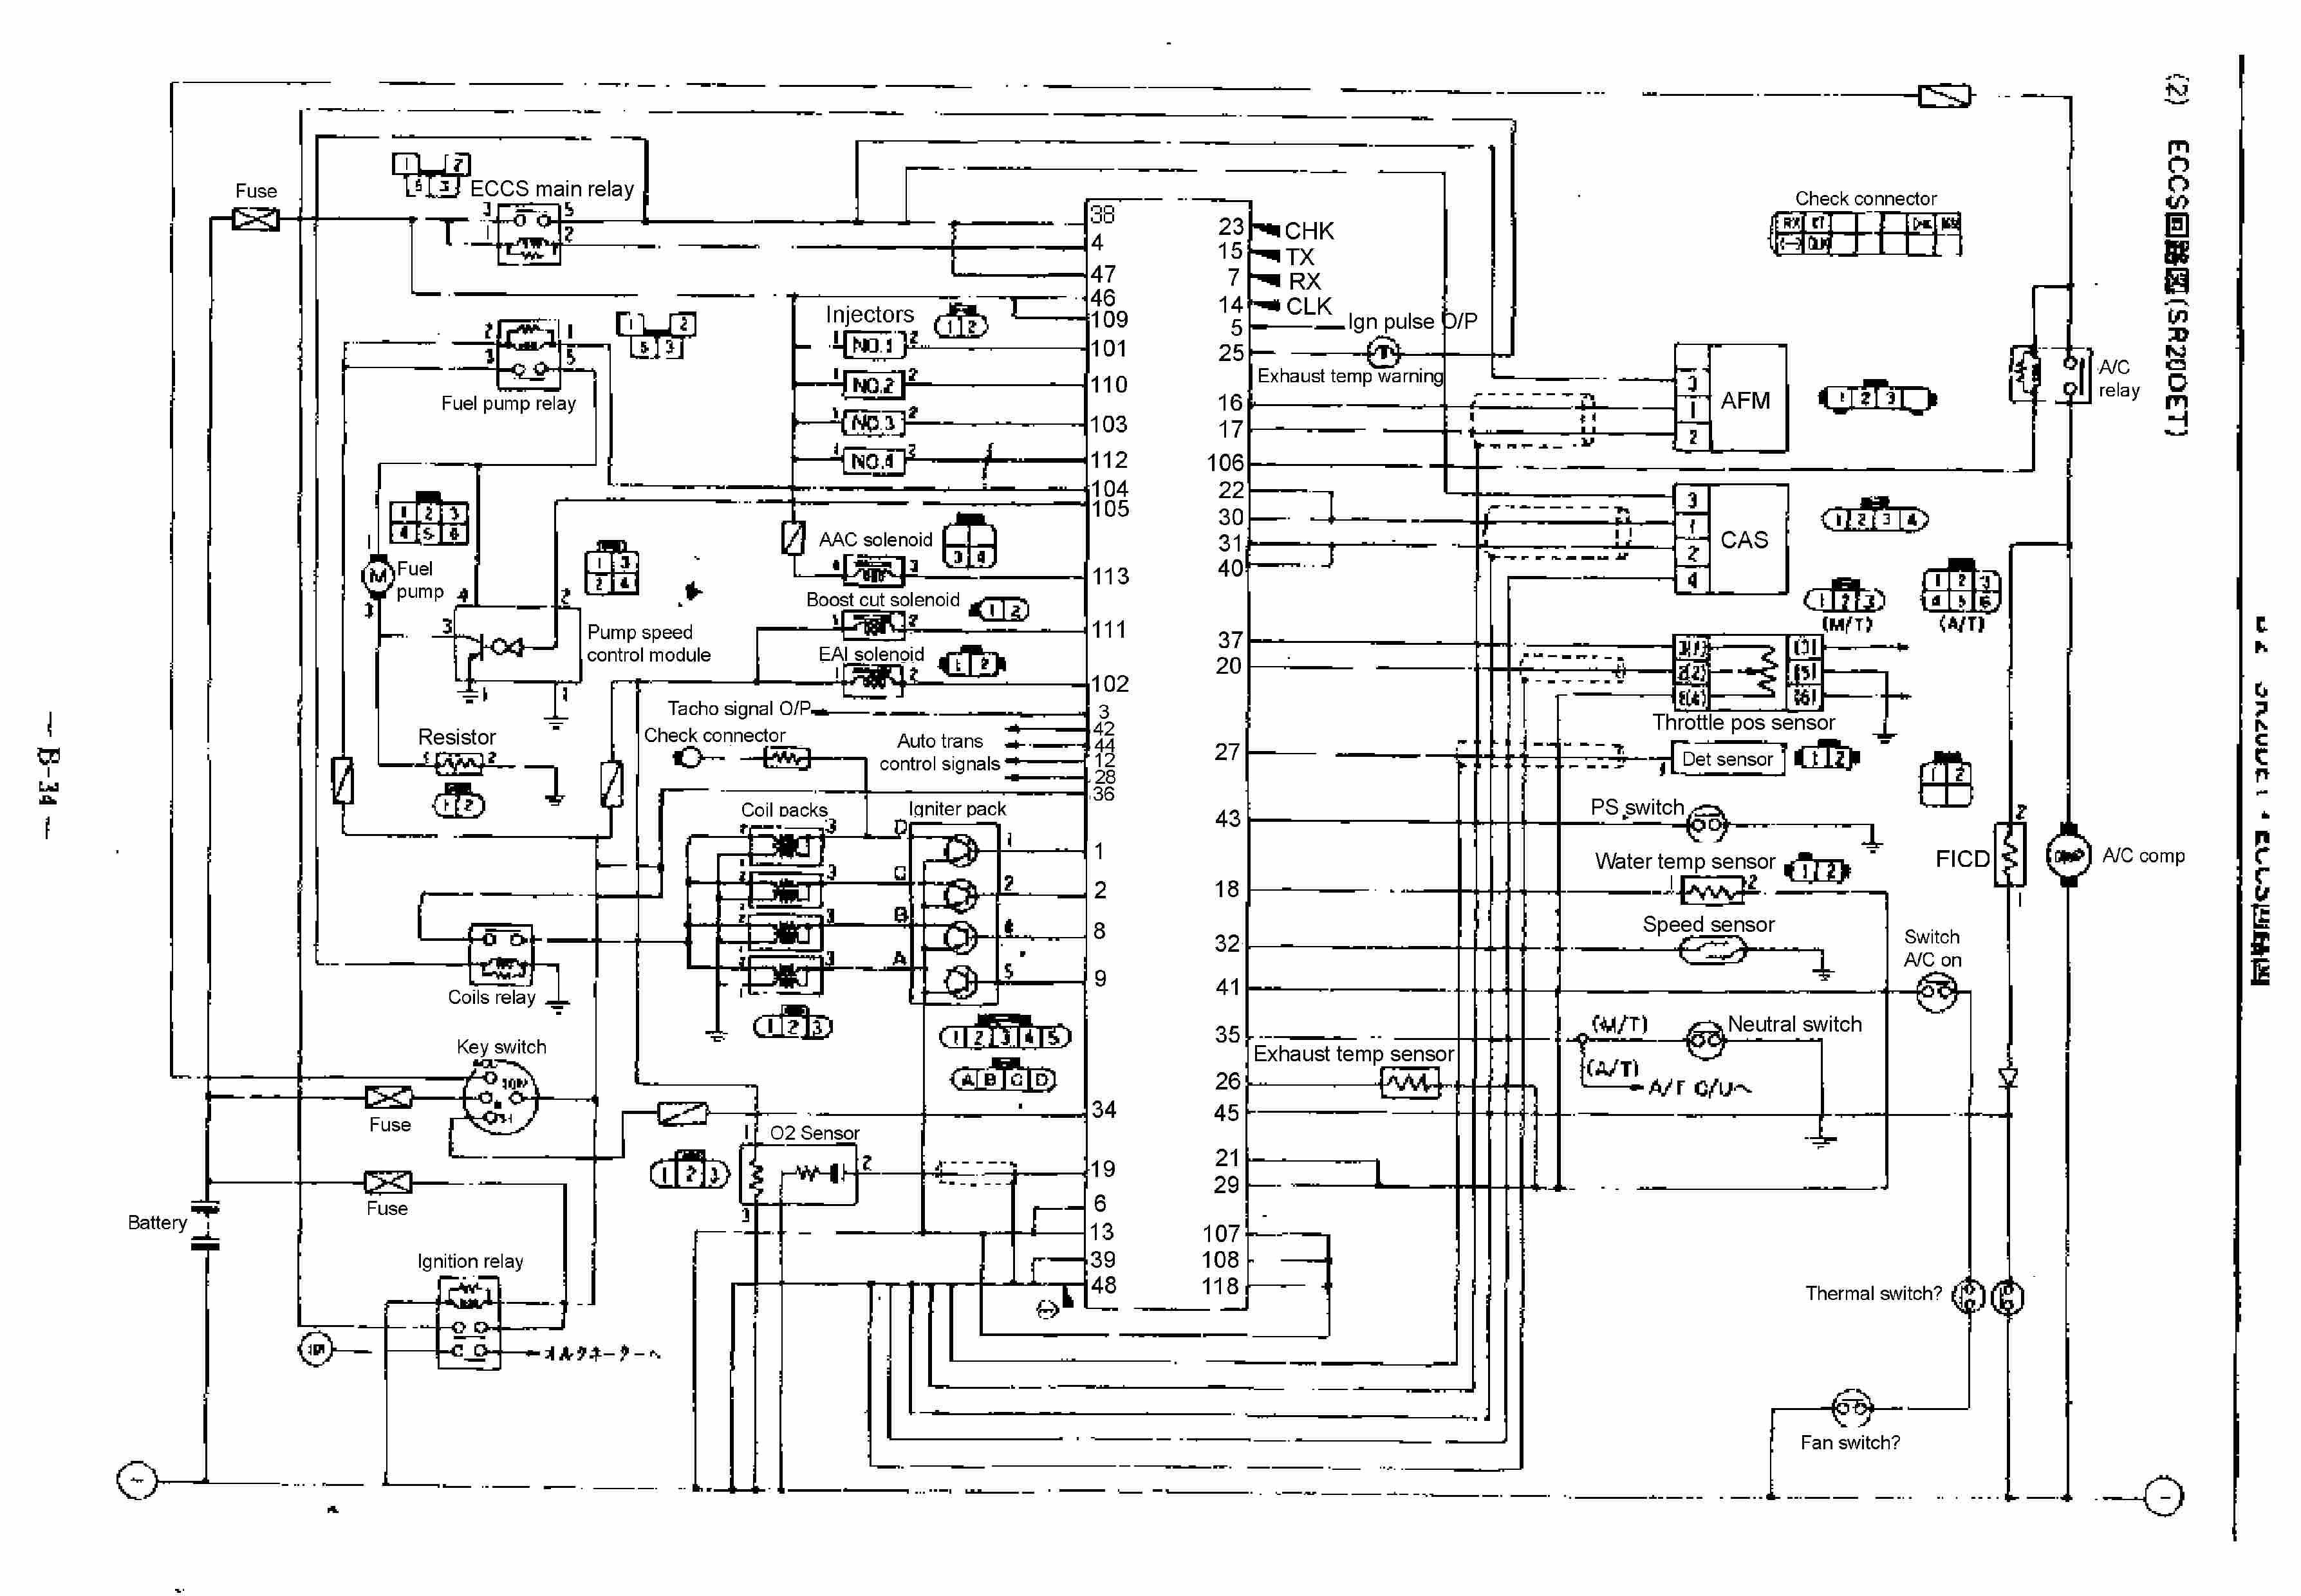 2008 Trailblazer Wireing Diagram Auto Electrical Wiring Warn 76080 Nissan Cabstar